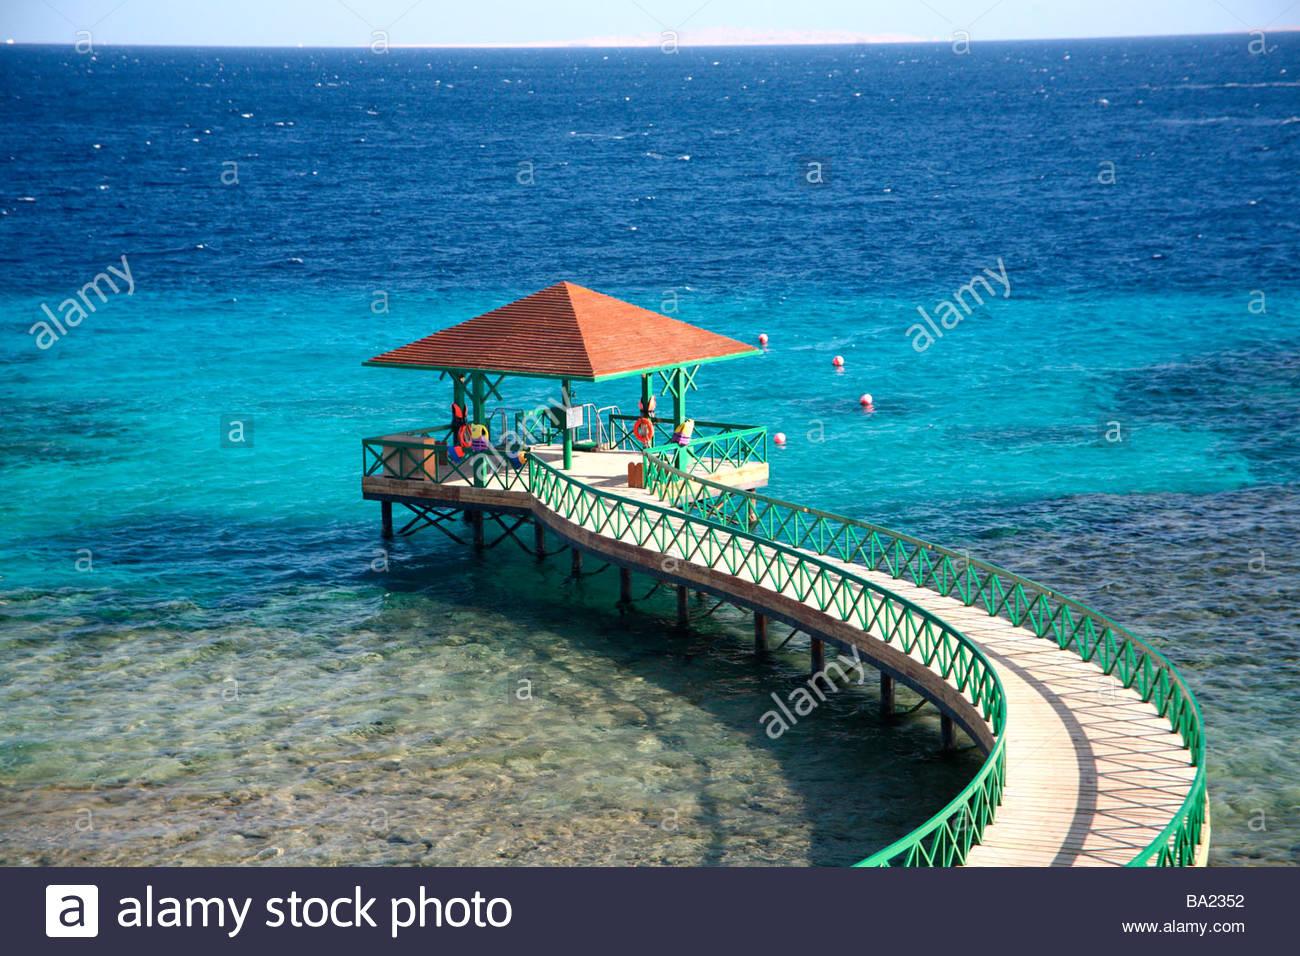 Oberoi hotel sahl hasheesh diving wharf red sea coast of egypt stock photo 23403326 alamy - Dive inn resort egypt ...